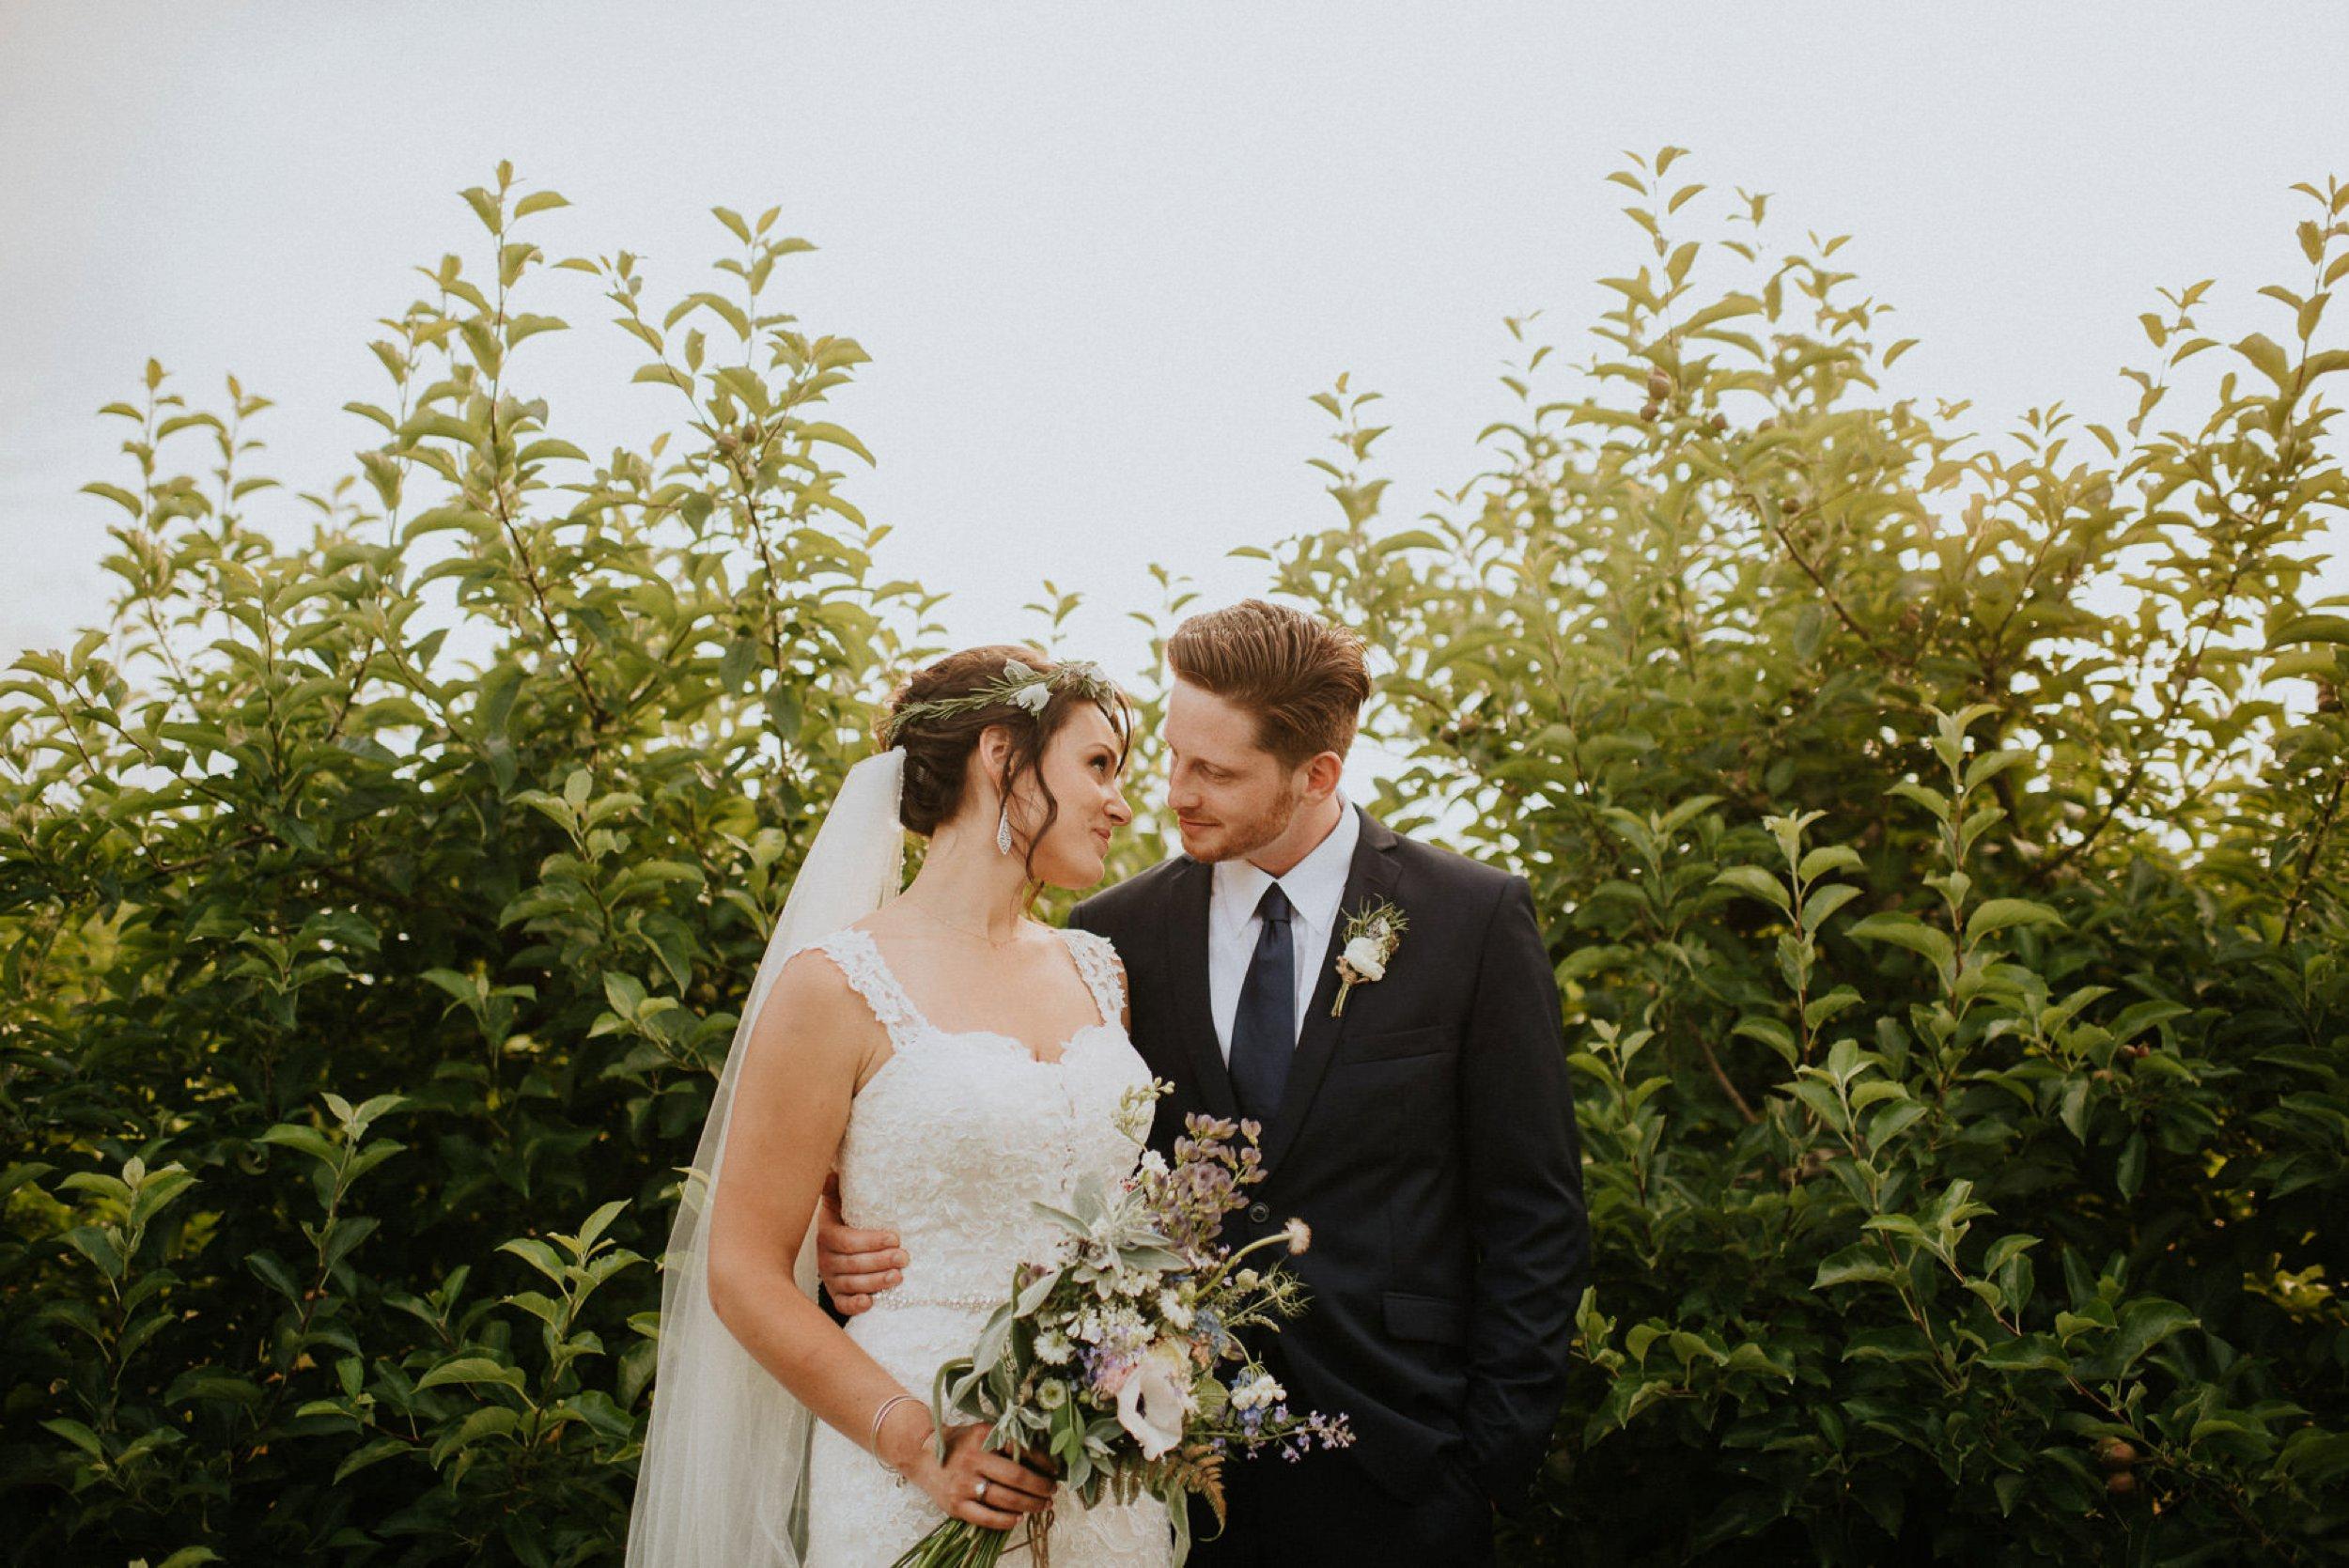 milburn_farms-wedding-66.jpg